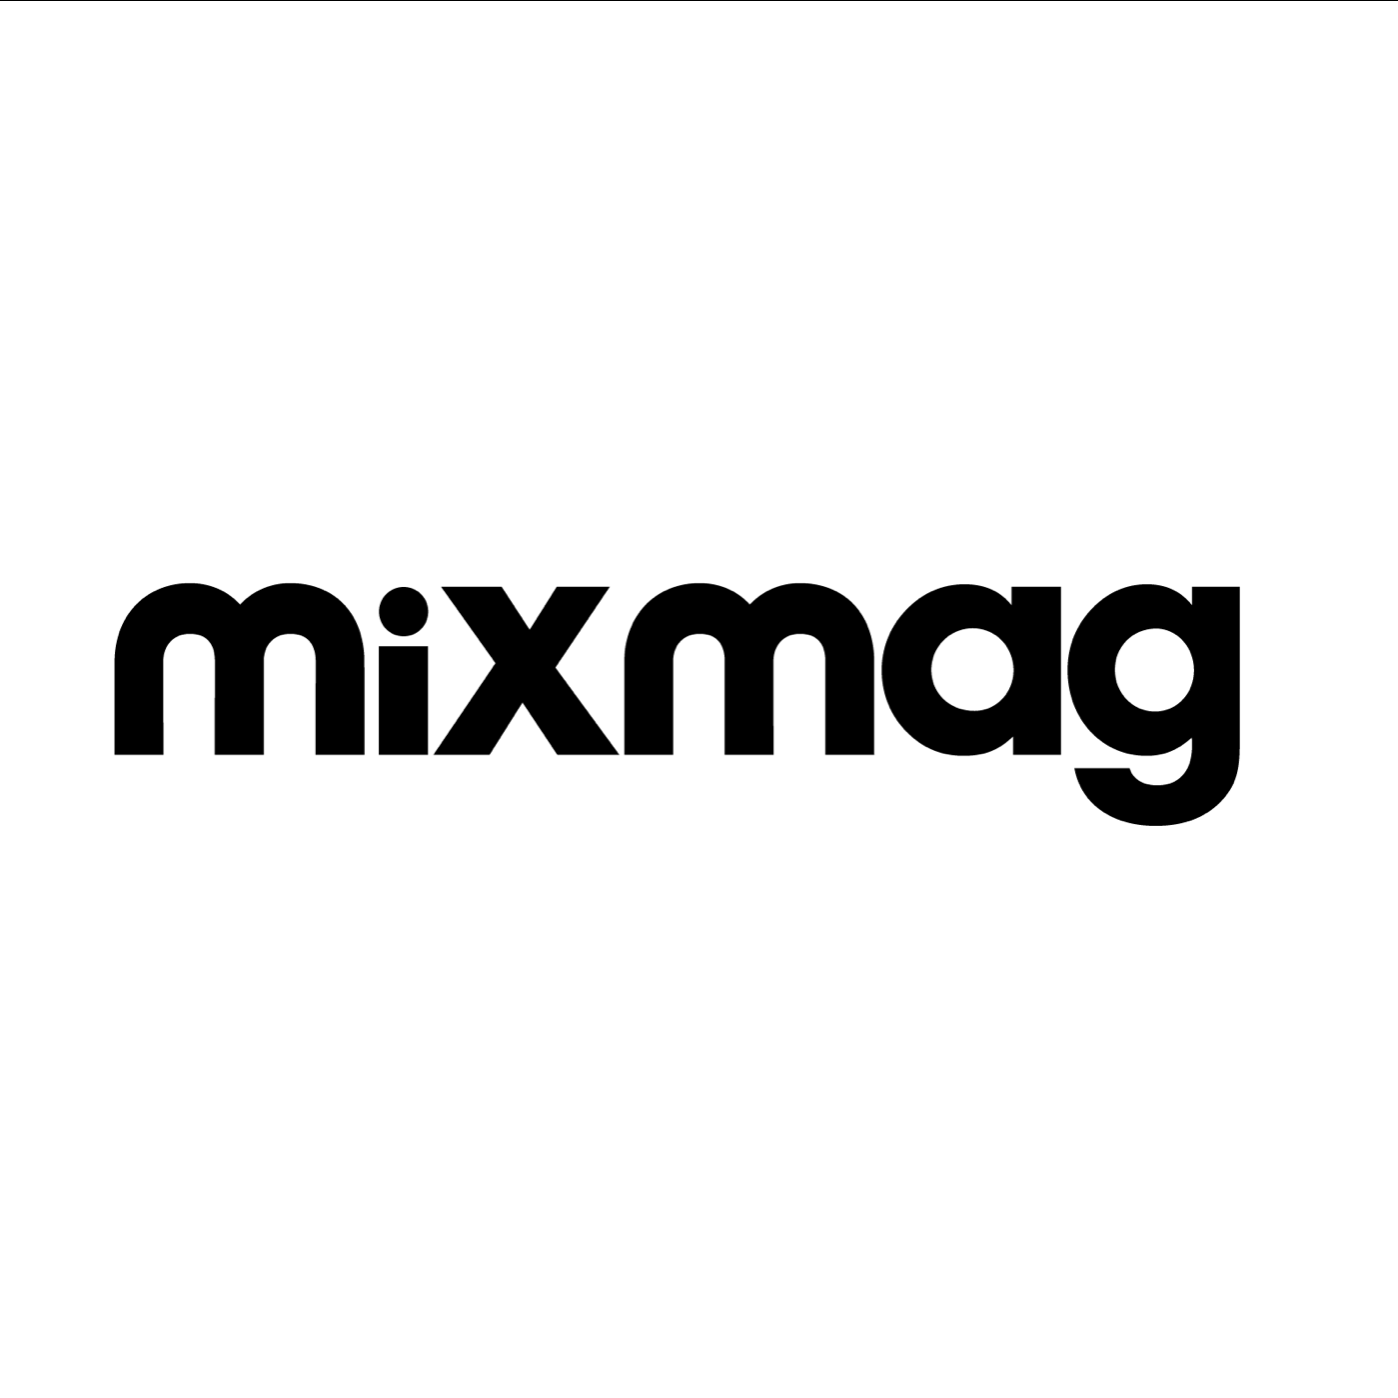 Mixmag Logo